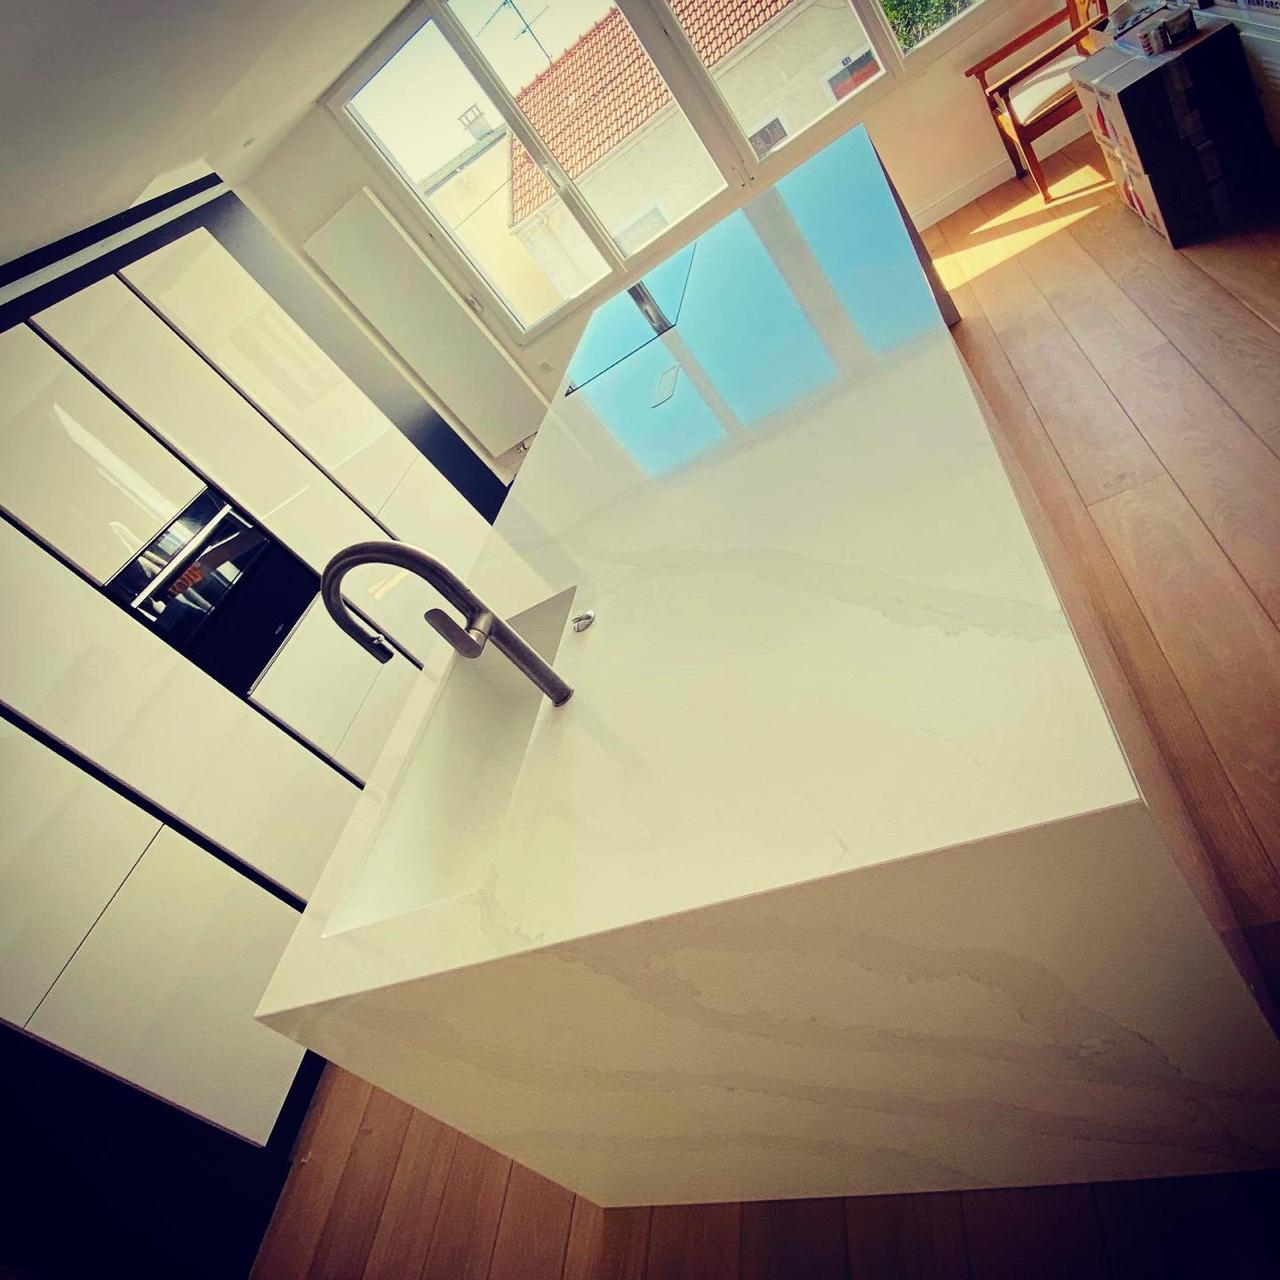 Plan-travail-cuisine-sur-mesure-marbrerie-silestone-STC-Paris